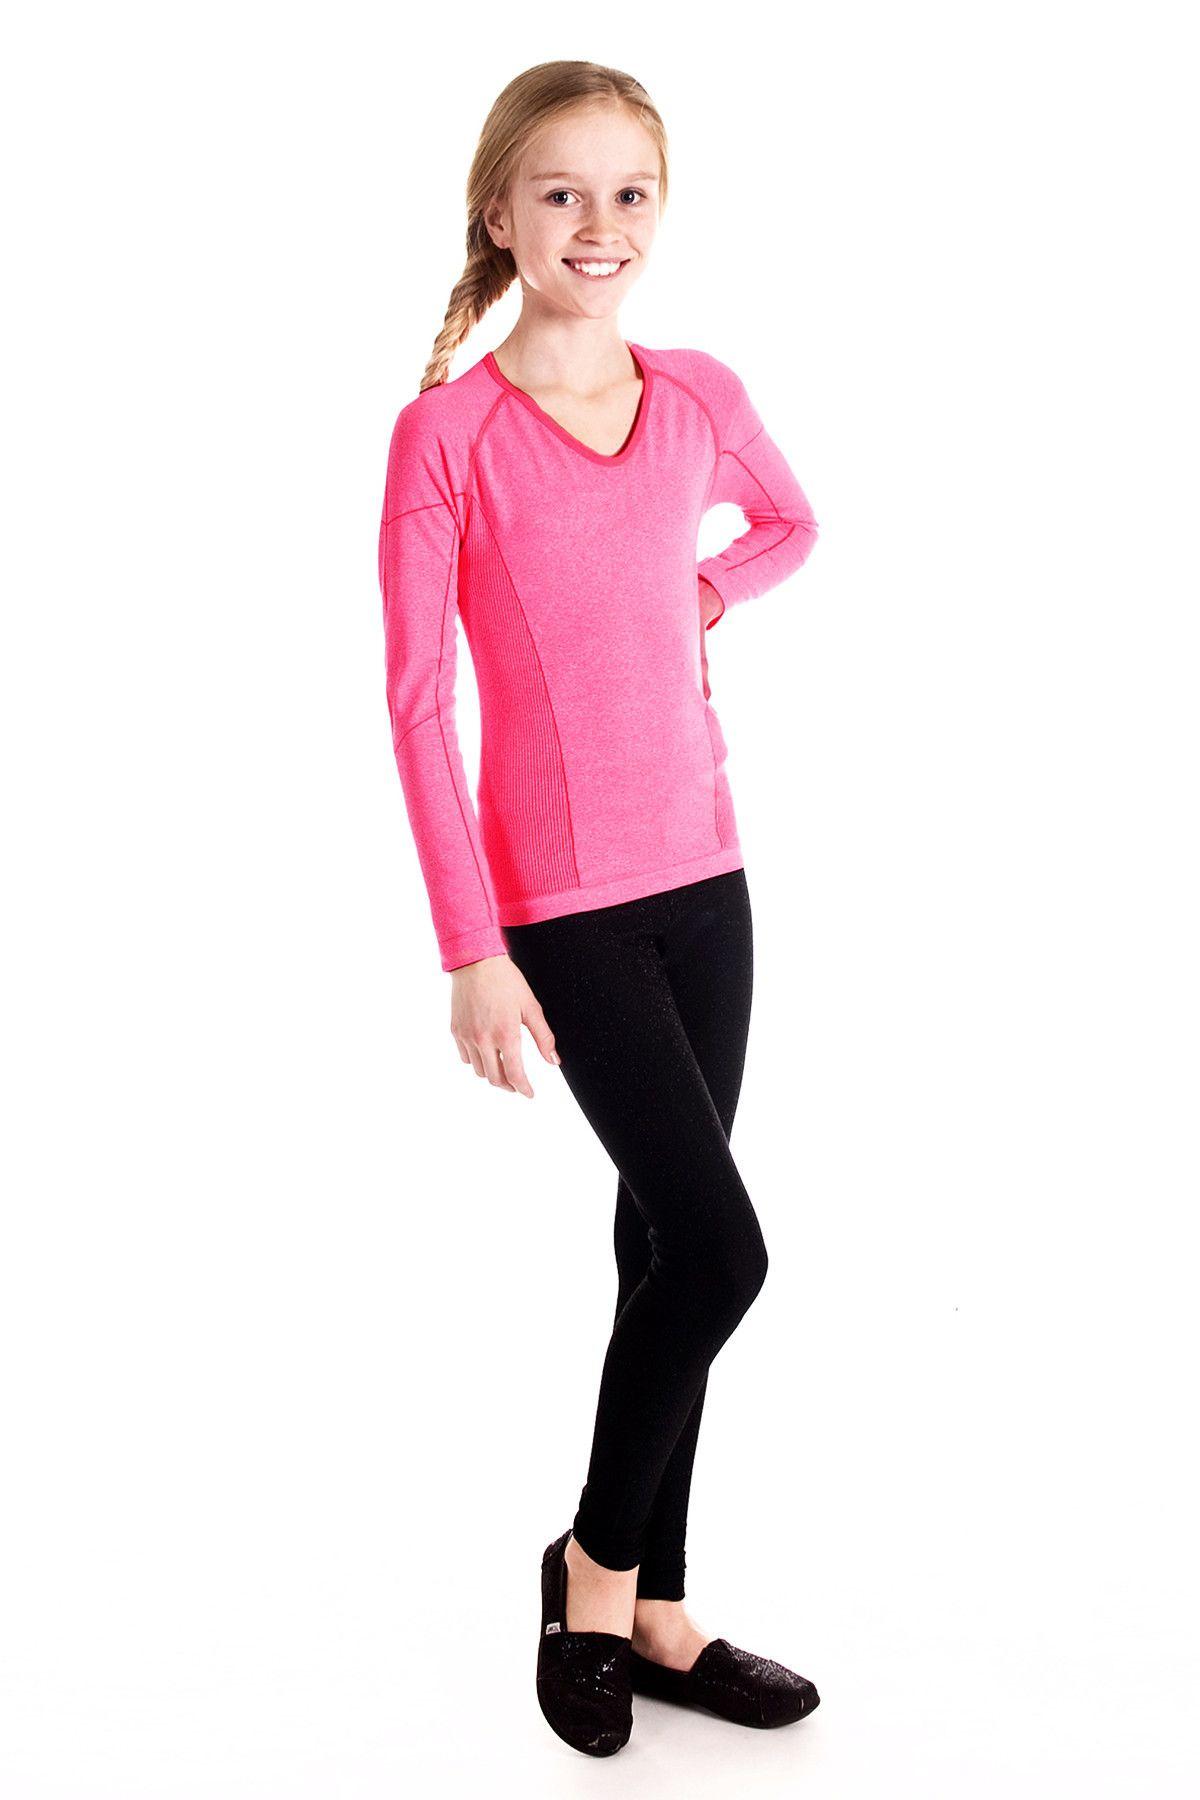 Girls Activewear - Black Seamless Leggings - Limeapple | Active wear  leggings, Girls activewear, Active wear tops